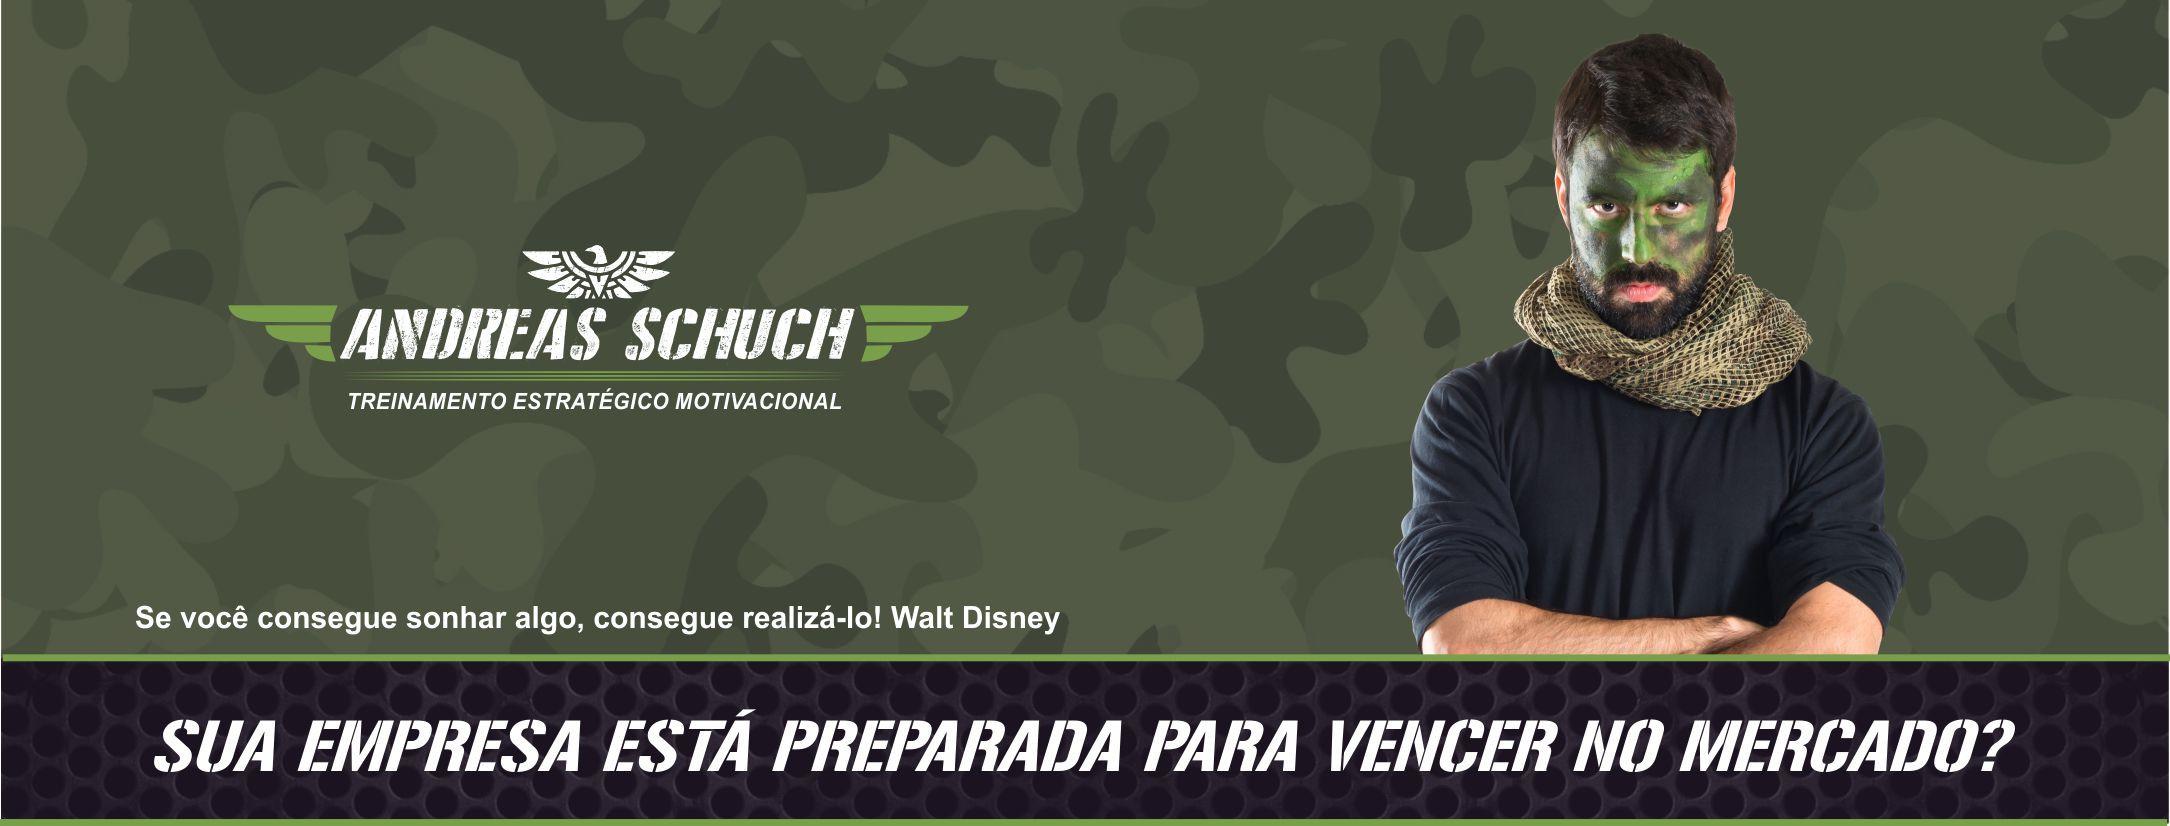 Treinamento Motivacional Andreas Schuch Treinamentos Brasil